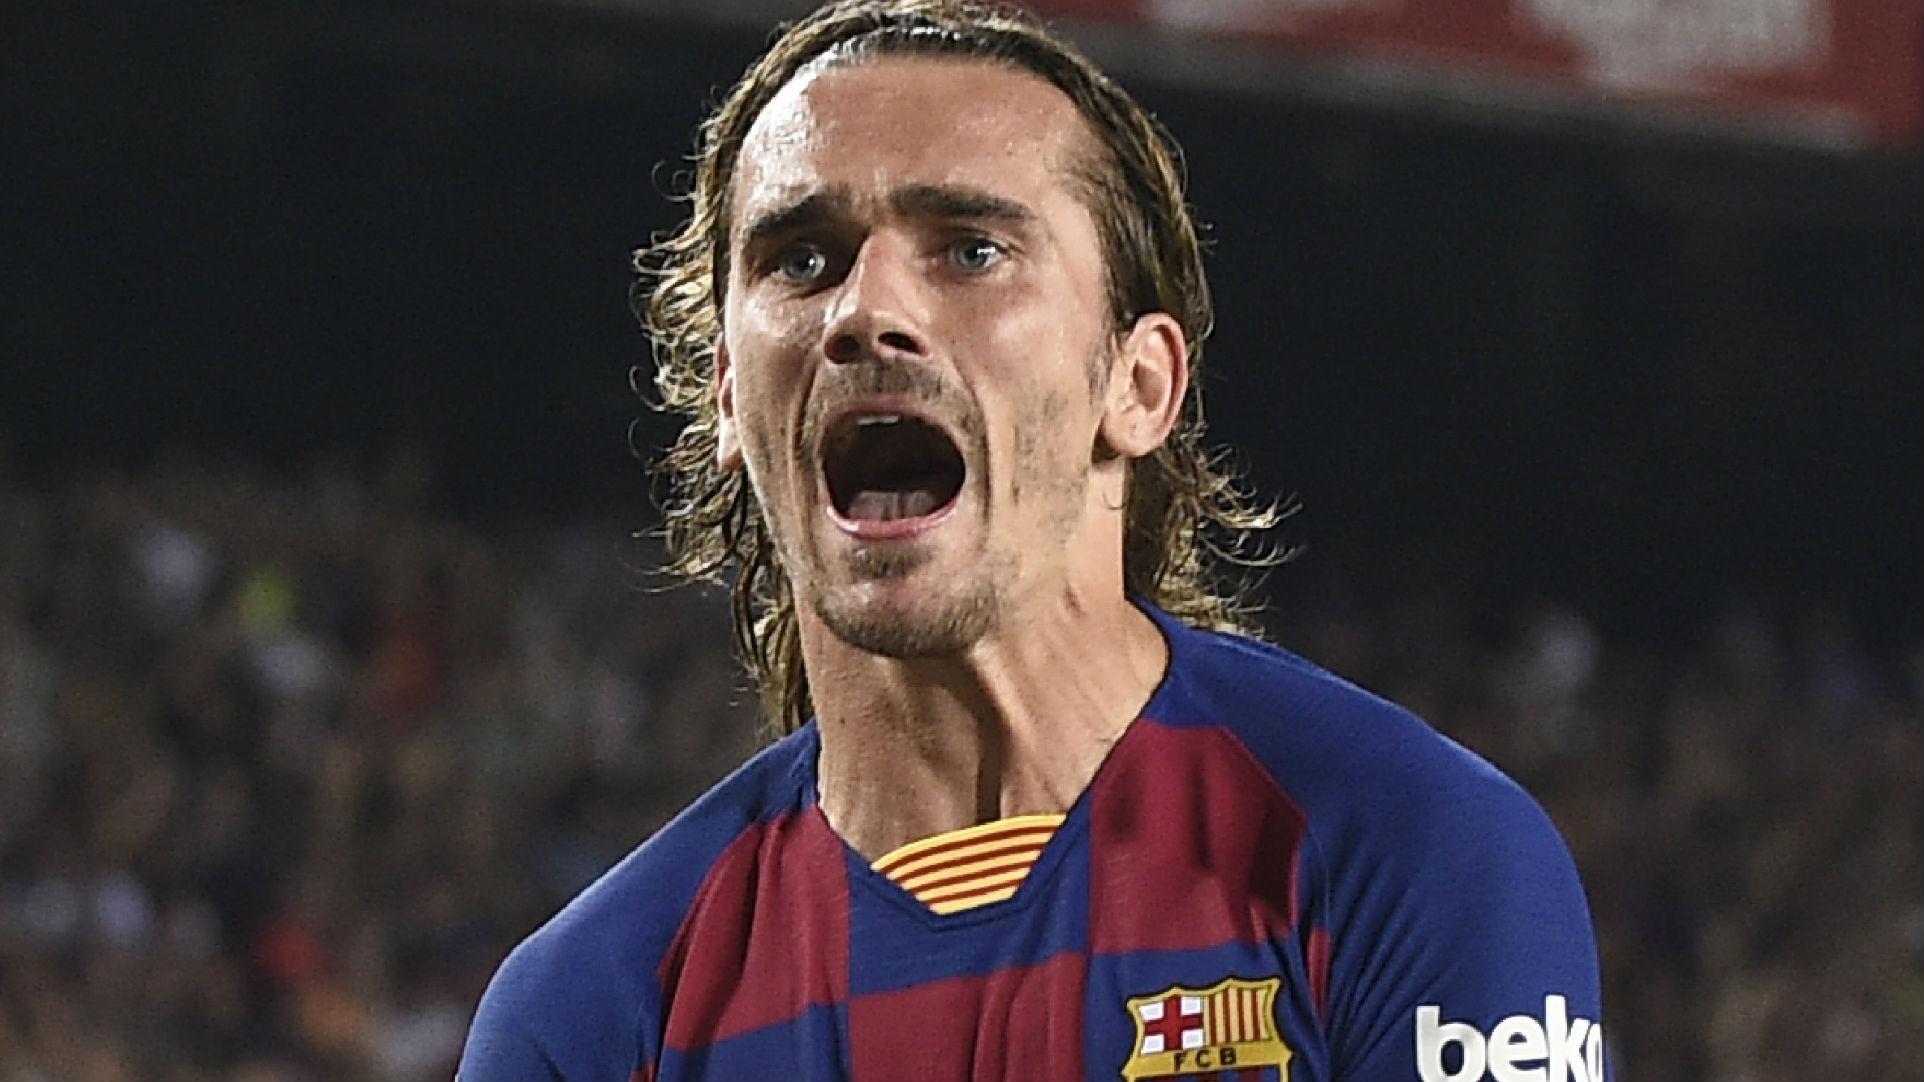 Griezmann scores historic brace in home Barcelona debut